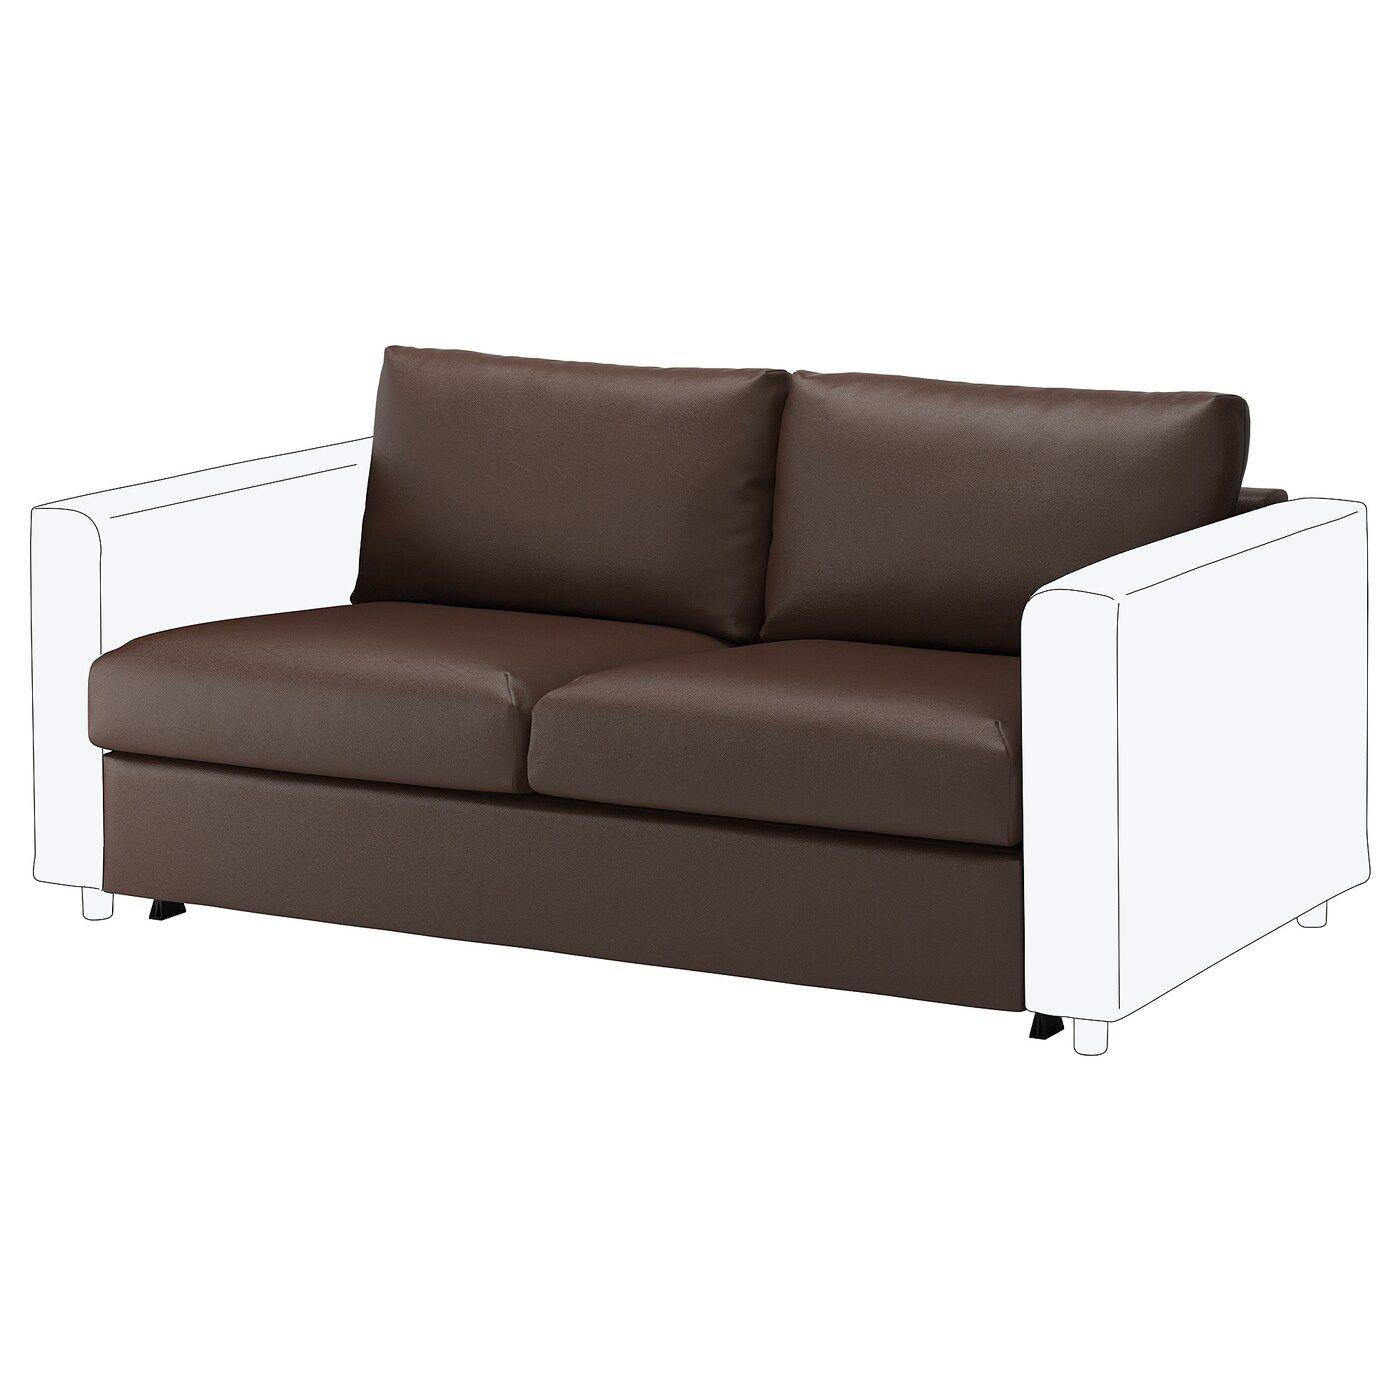 Ikea Vimle Loveseat Sleeper Section Modular Sofa Sofa Back